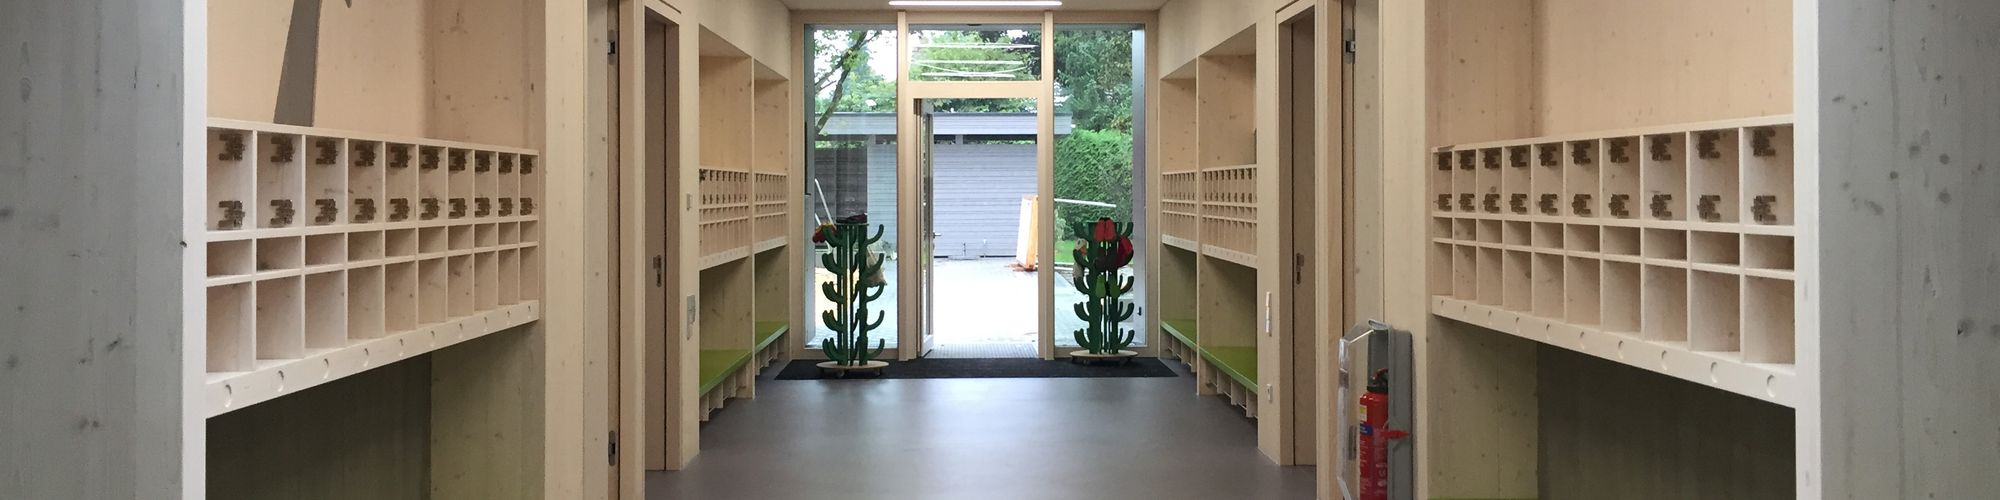 Kindergarten, Neubiberg